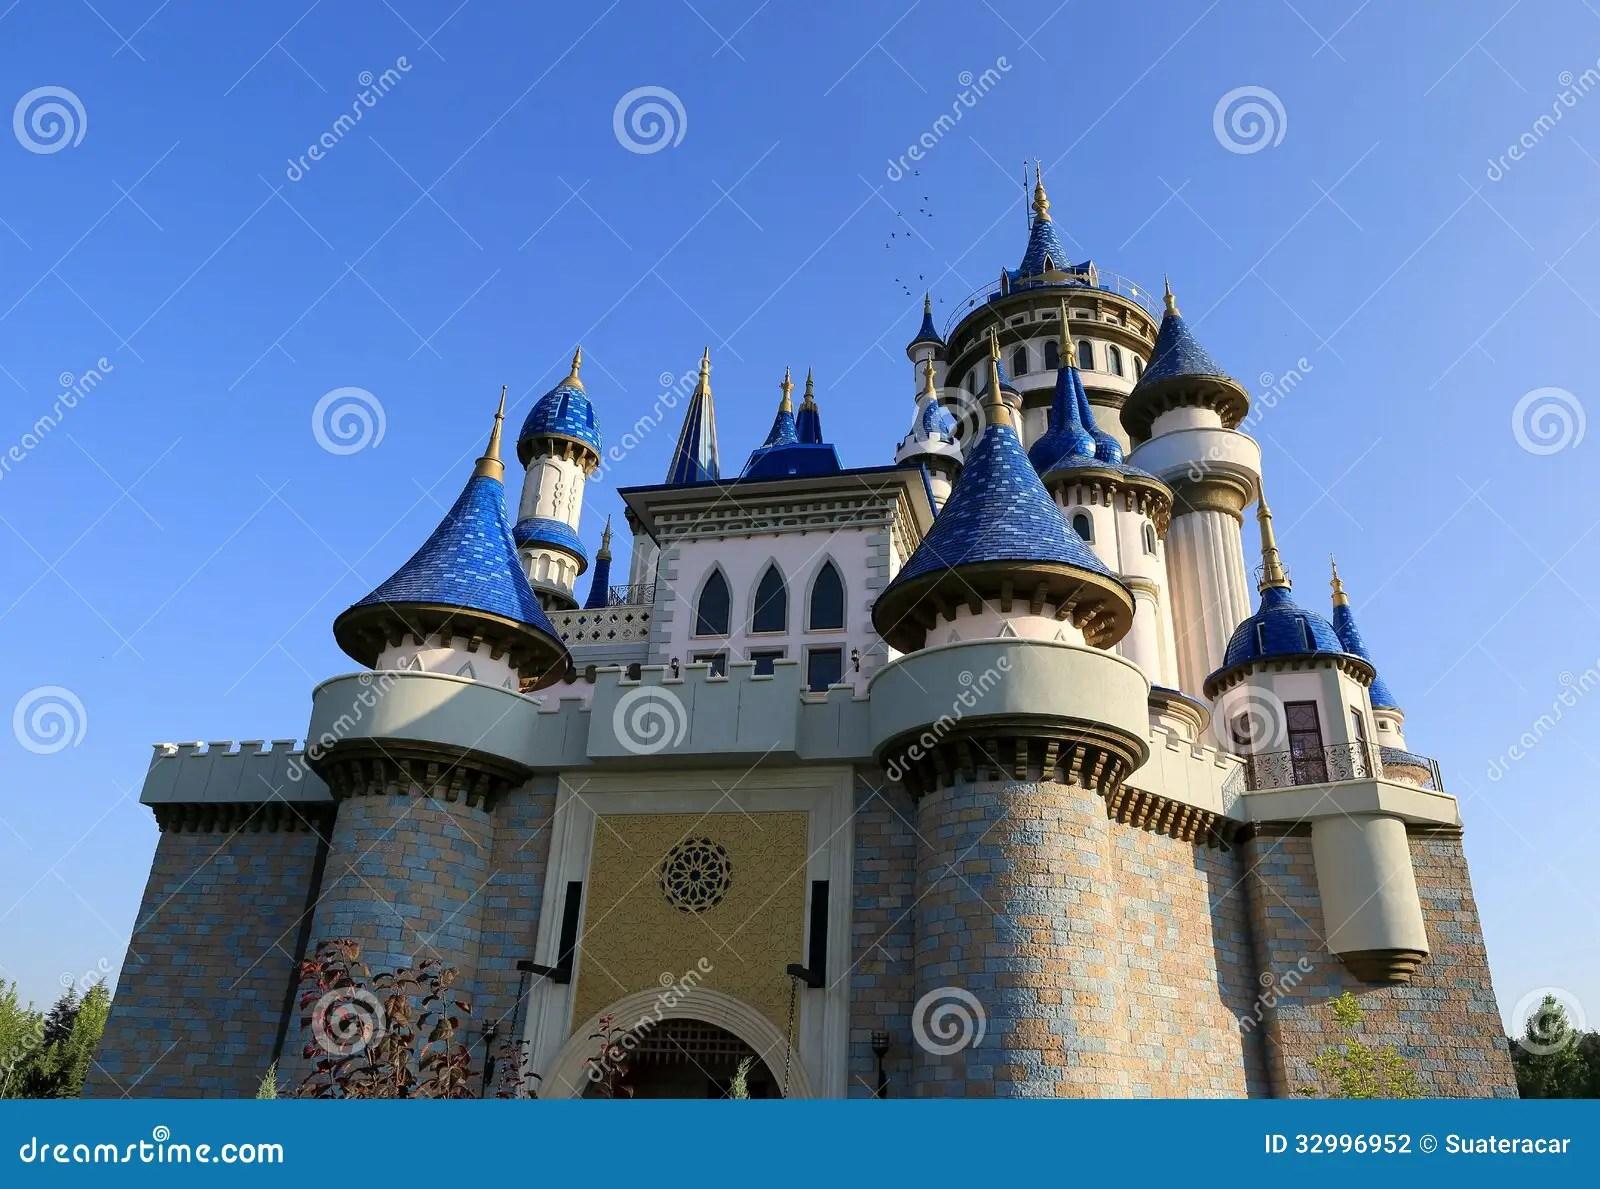 Fairytale Castle Stock Photography  Image 32996952